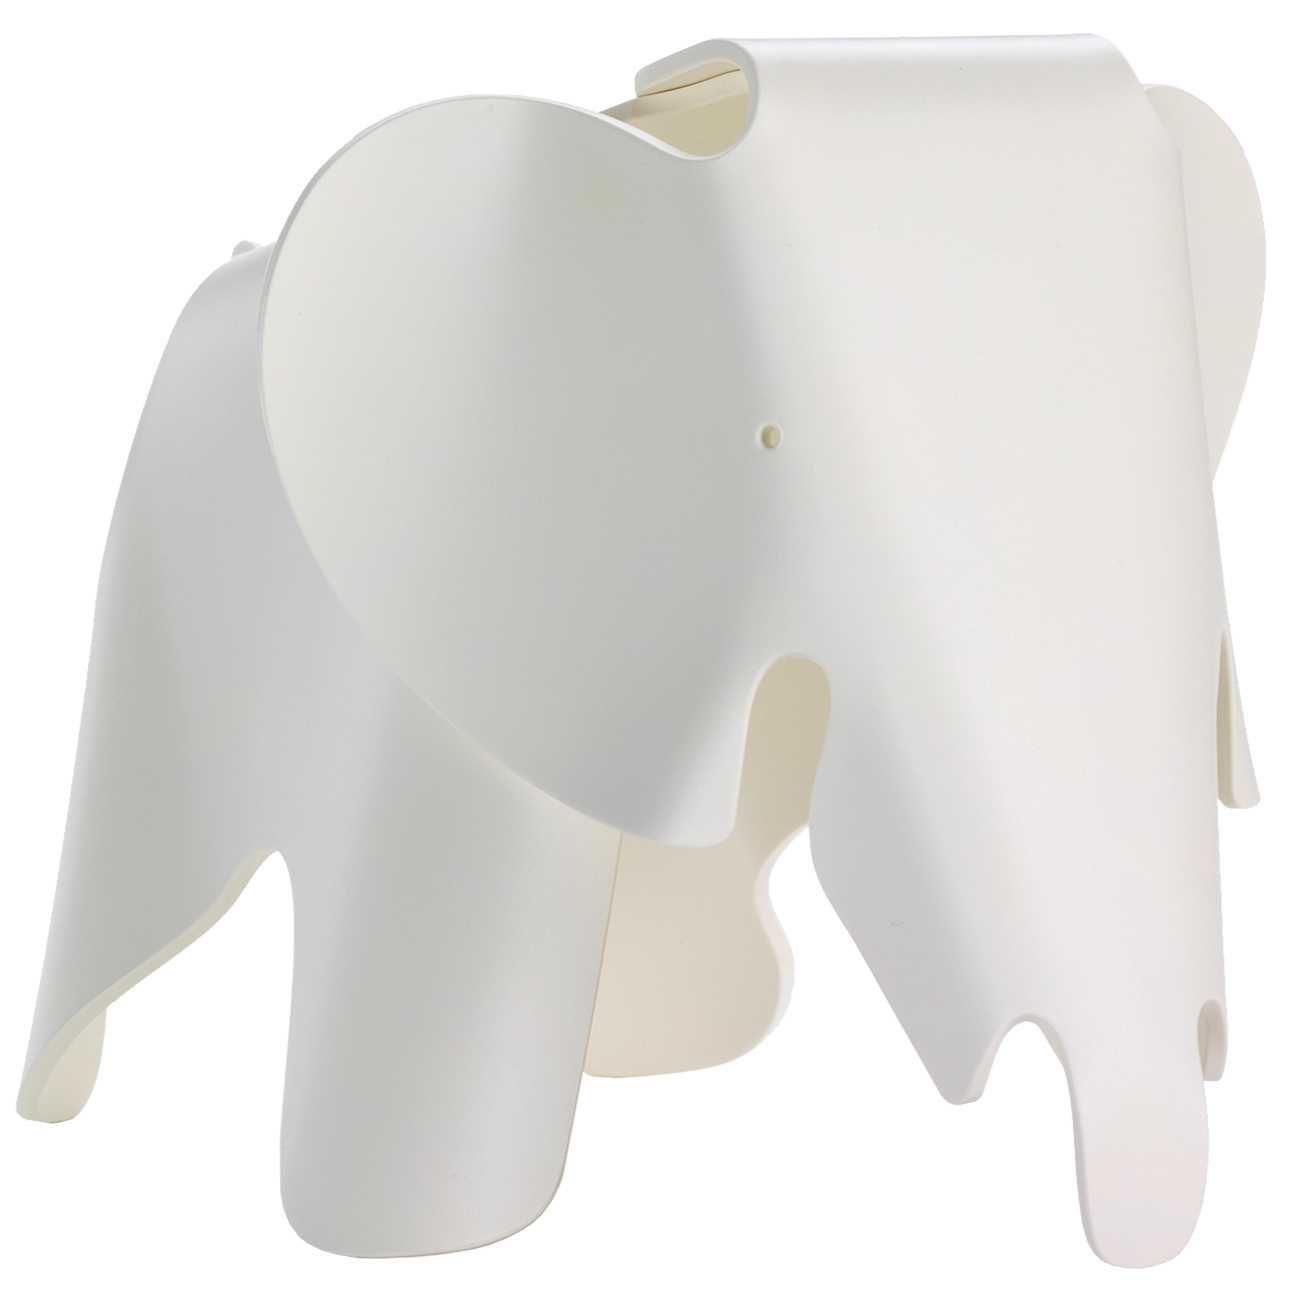 Vitra Eames Elephant kinderstoel wit kopen